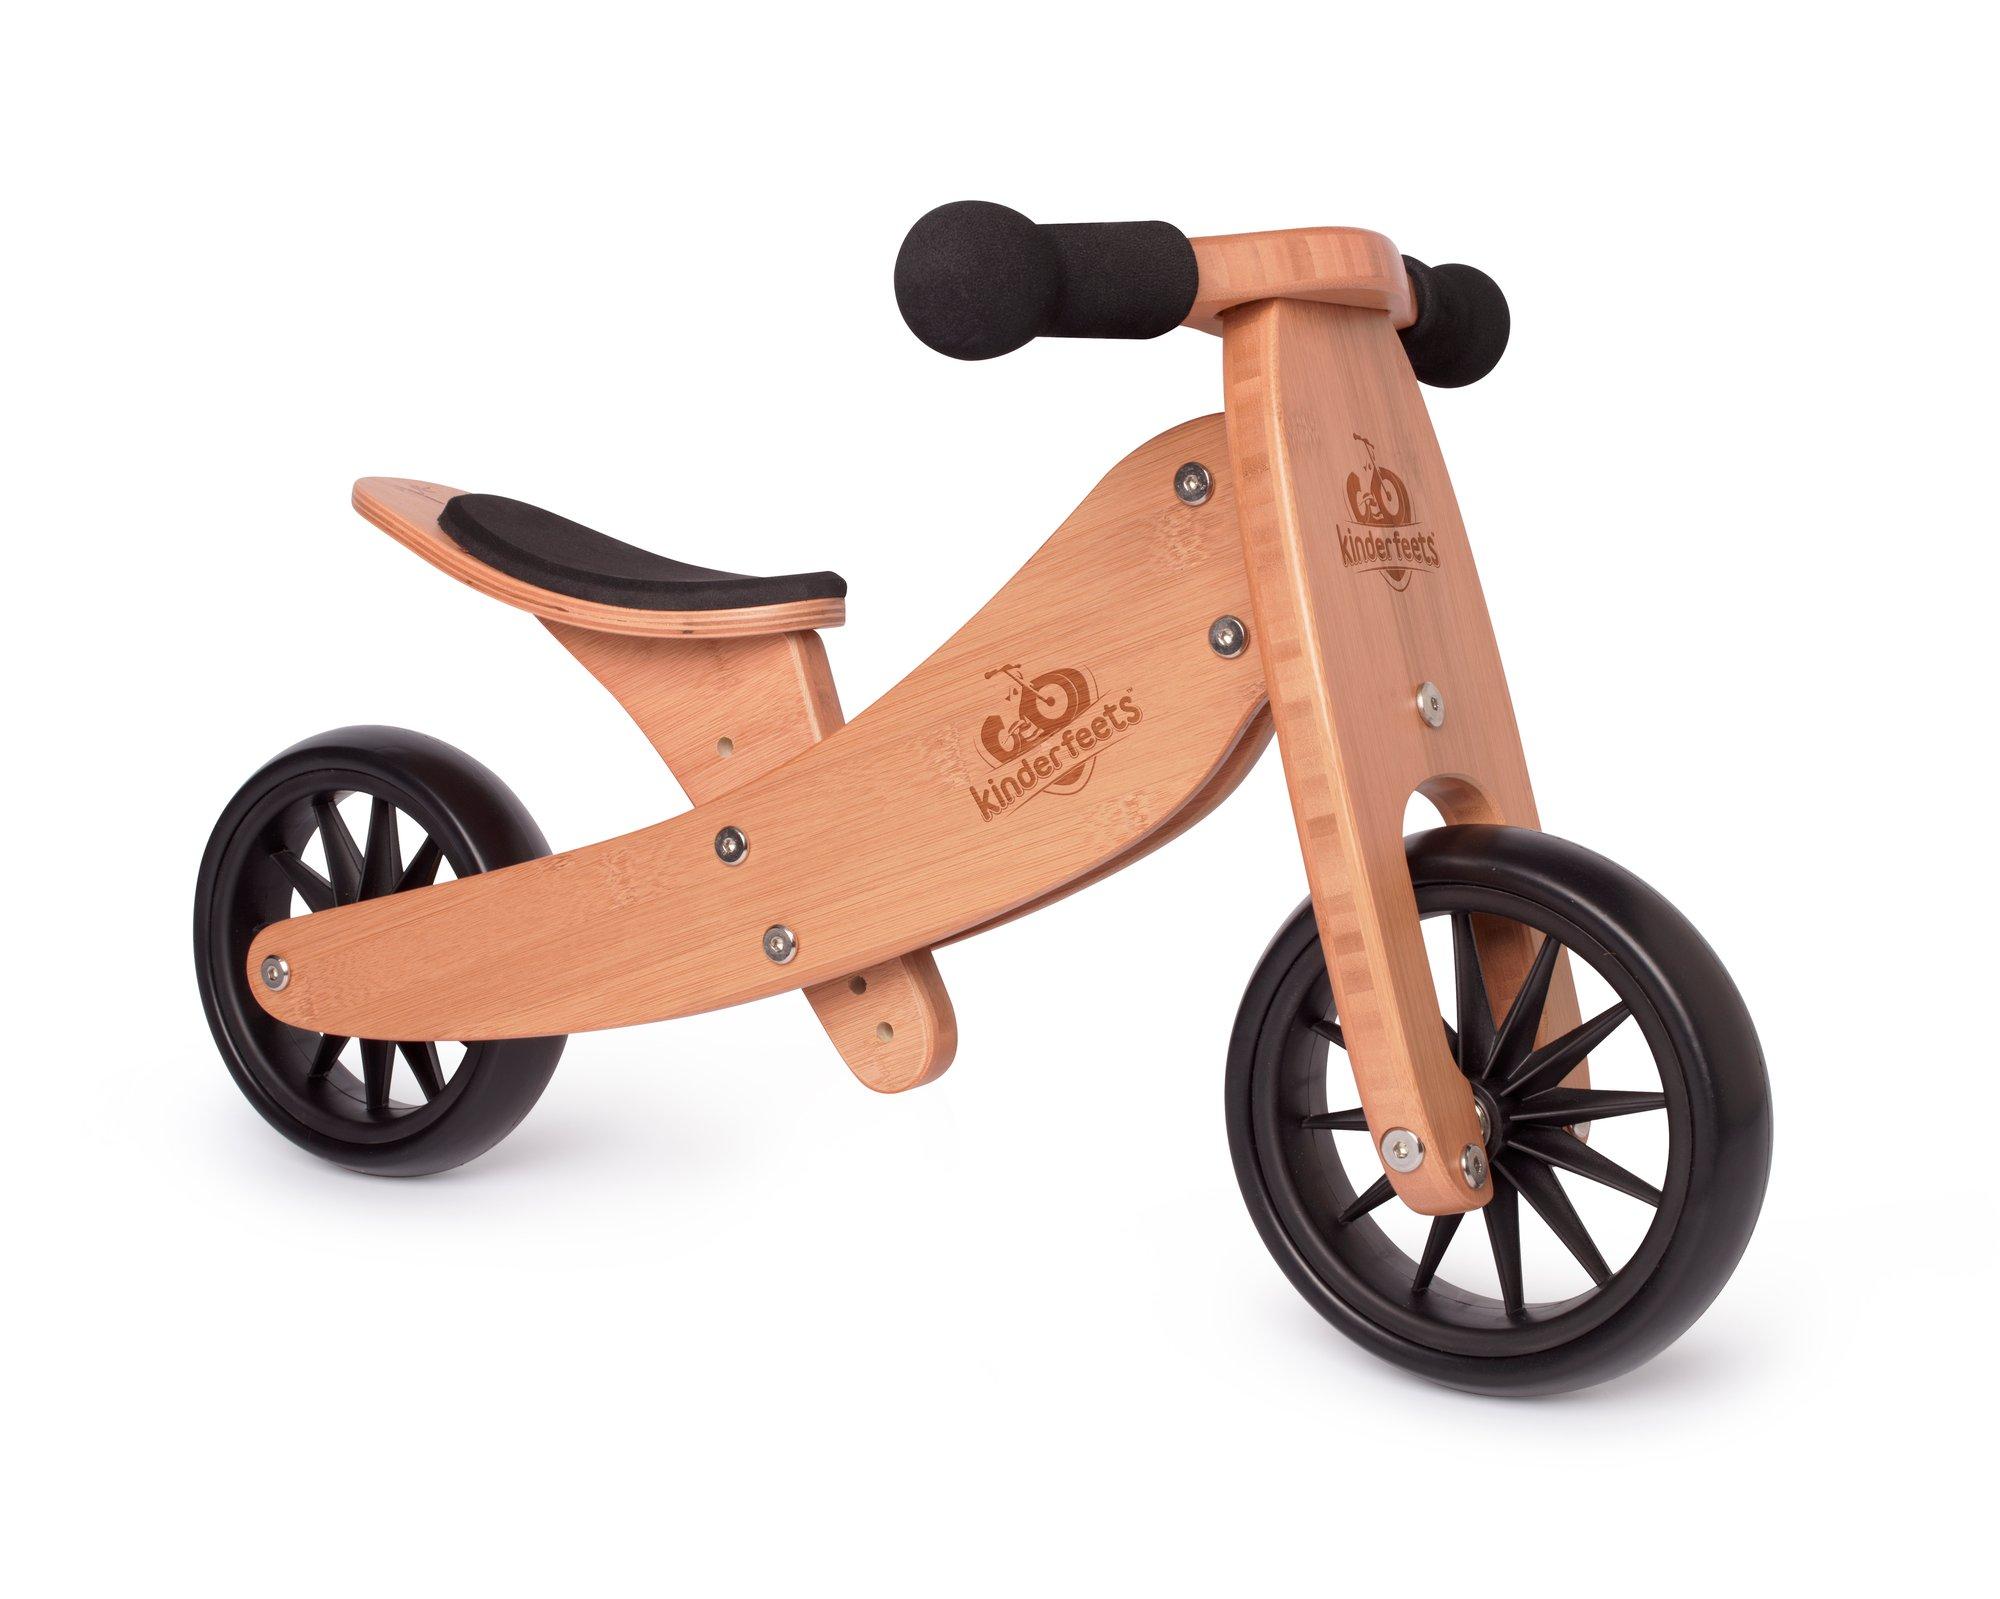 Kinderfeets 174 Bamboo Tiny Tot 2 1 Tricycle Balance Bike